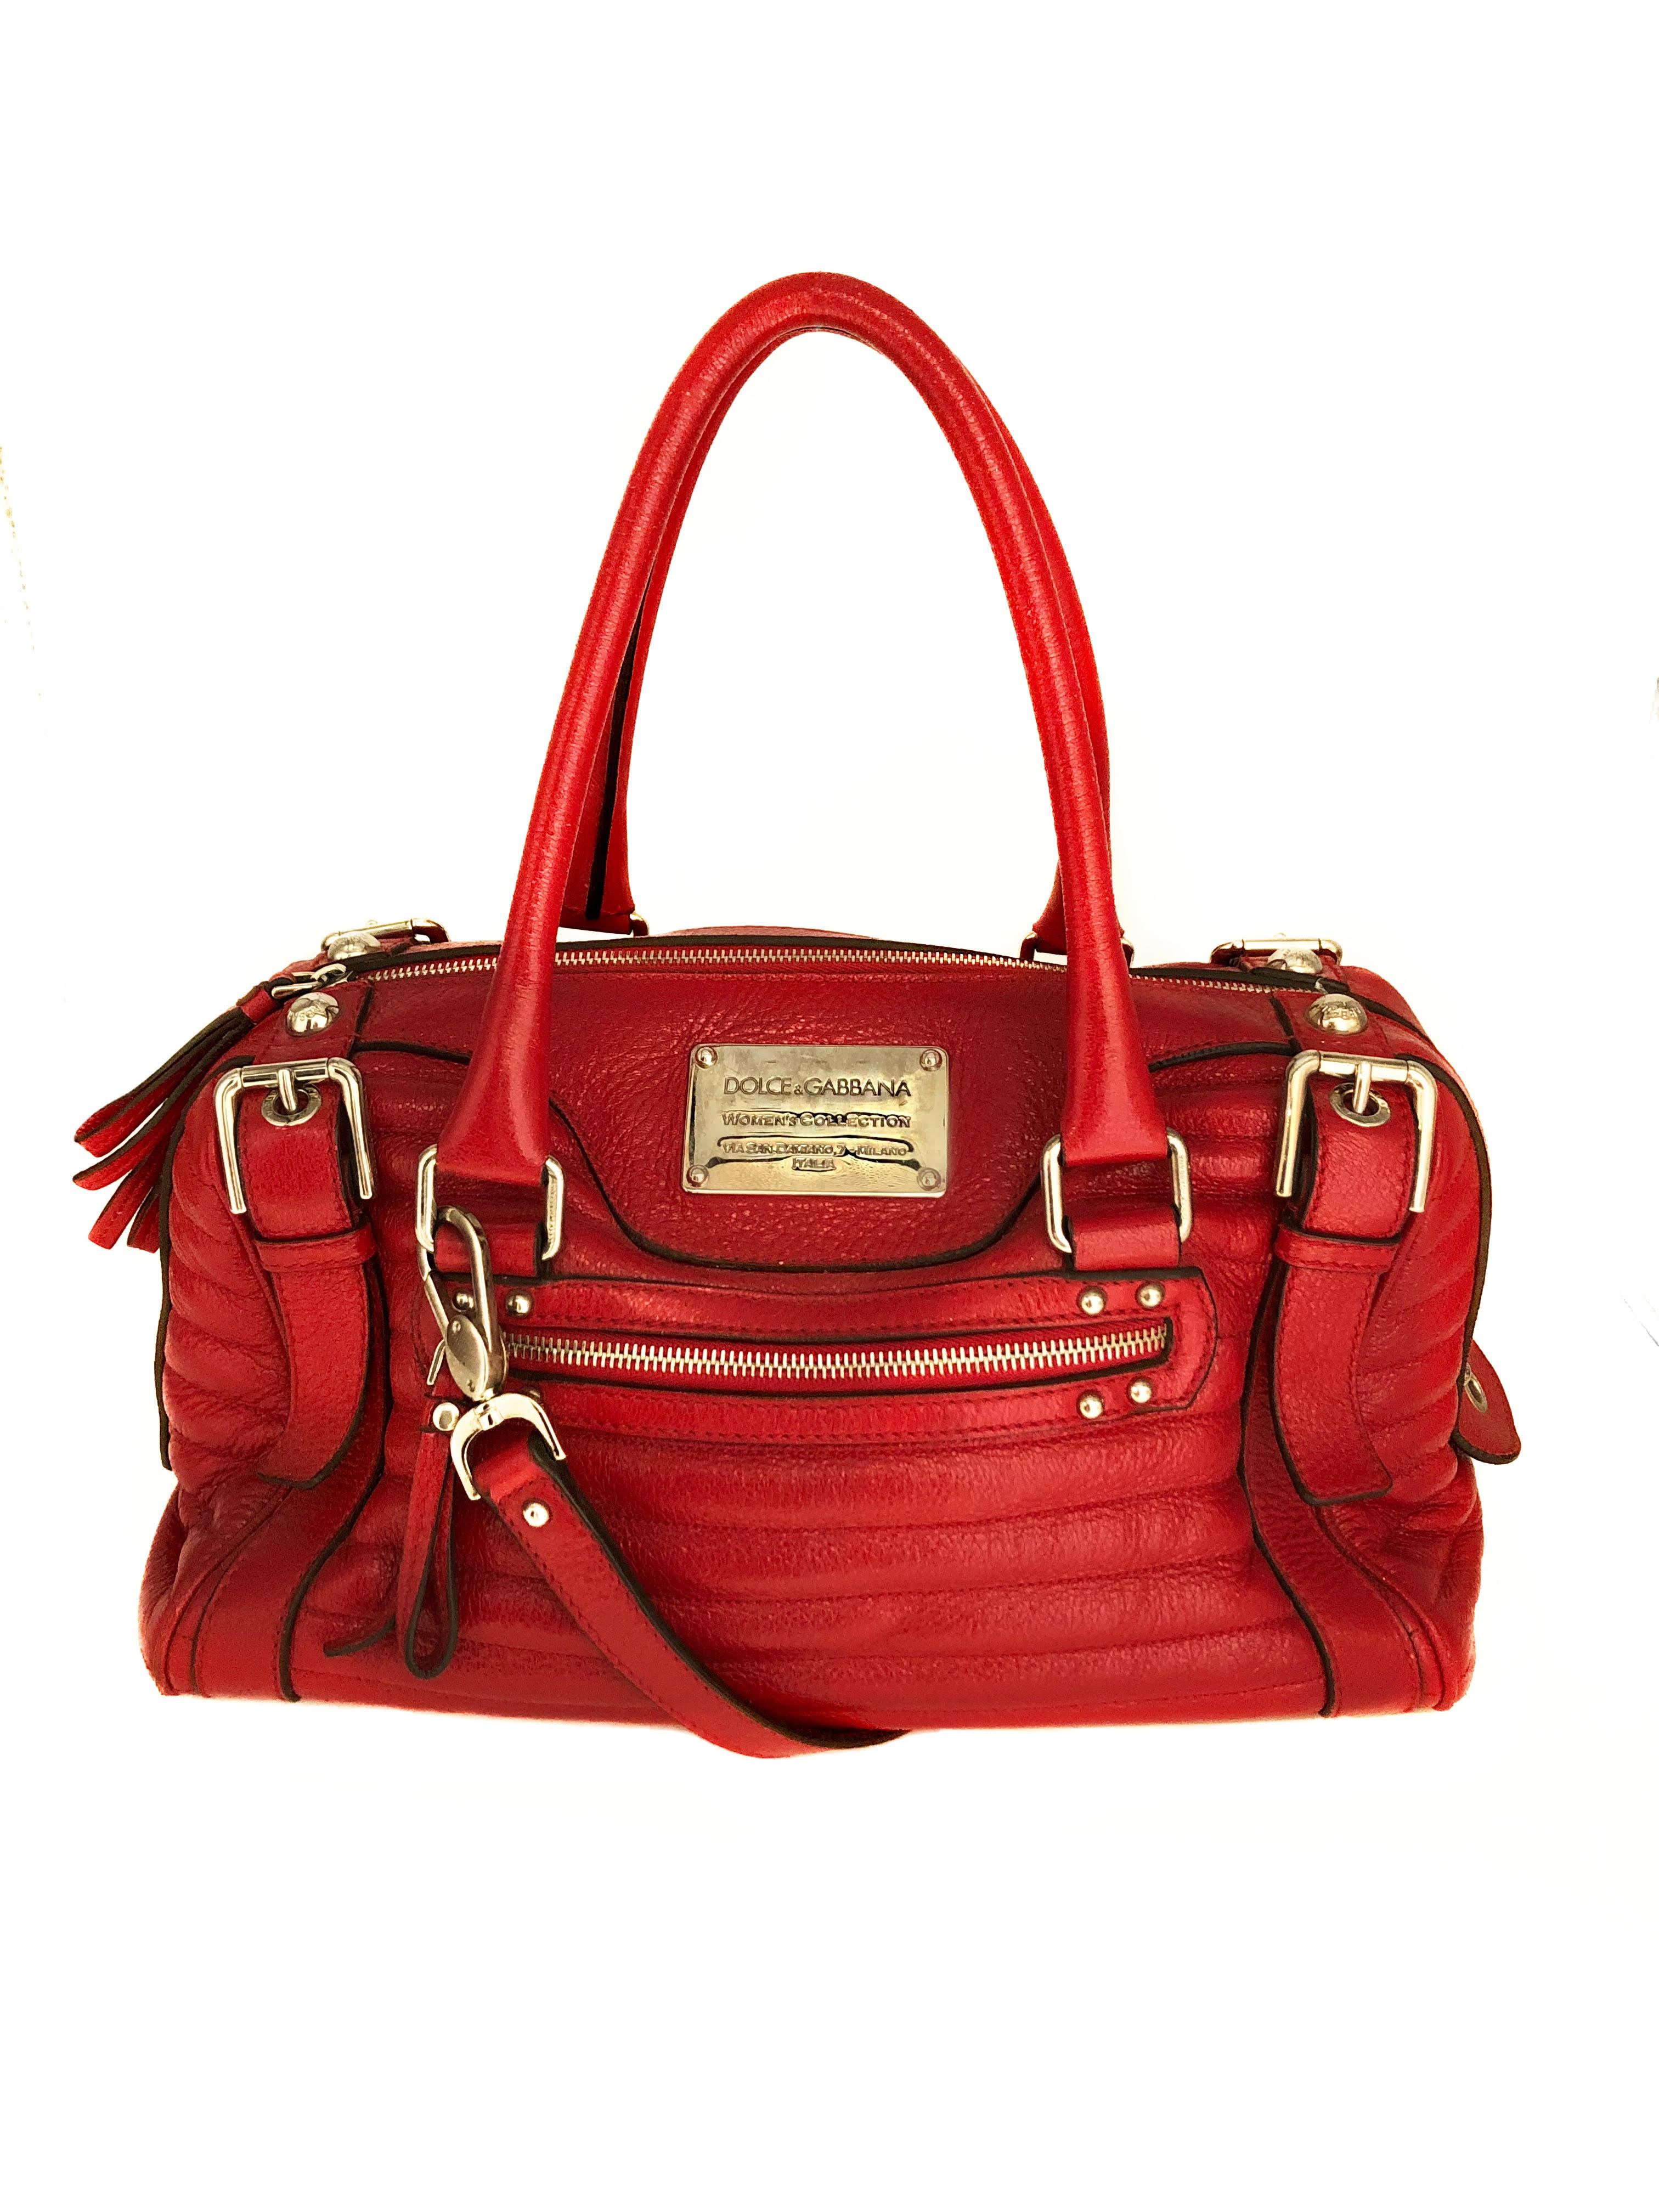 8151472b0 Dolce & Gabbana Miss Easy Way Satchel | Box de Grife